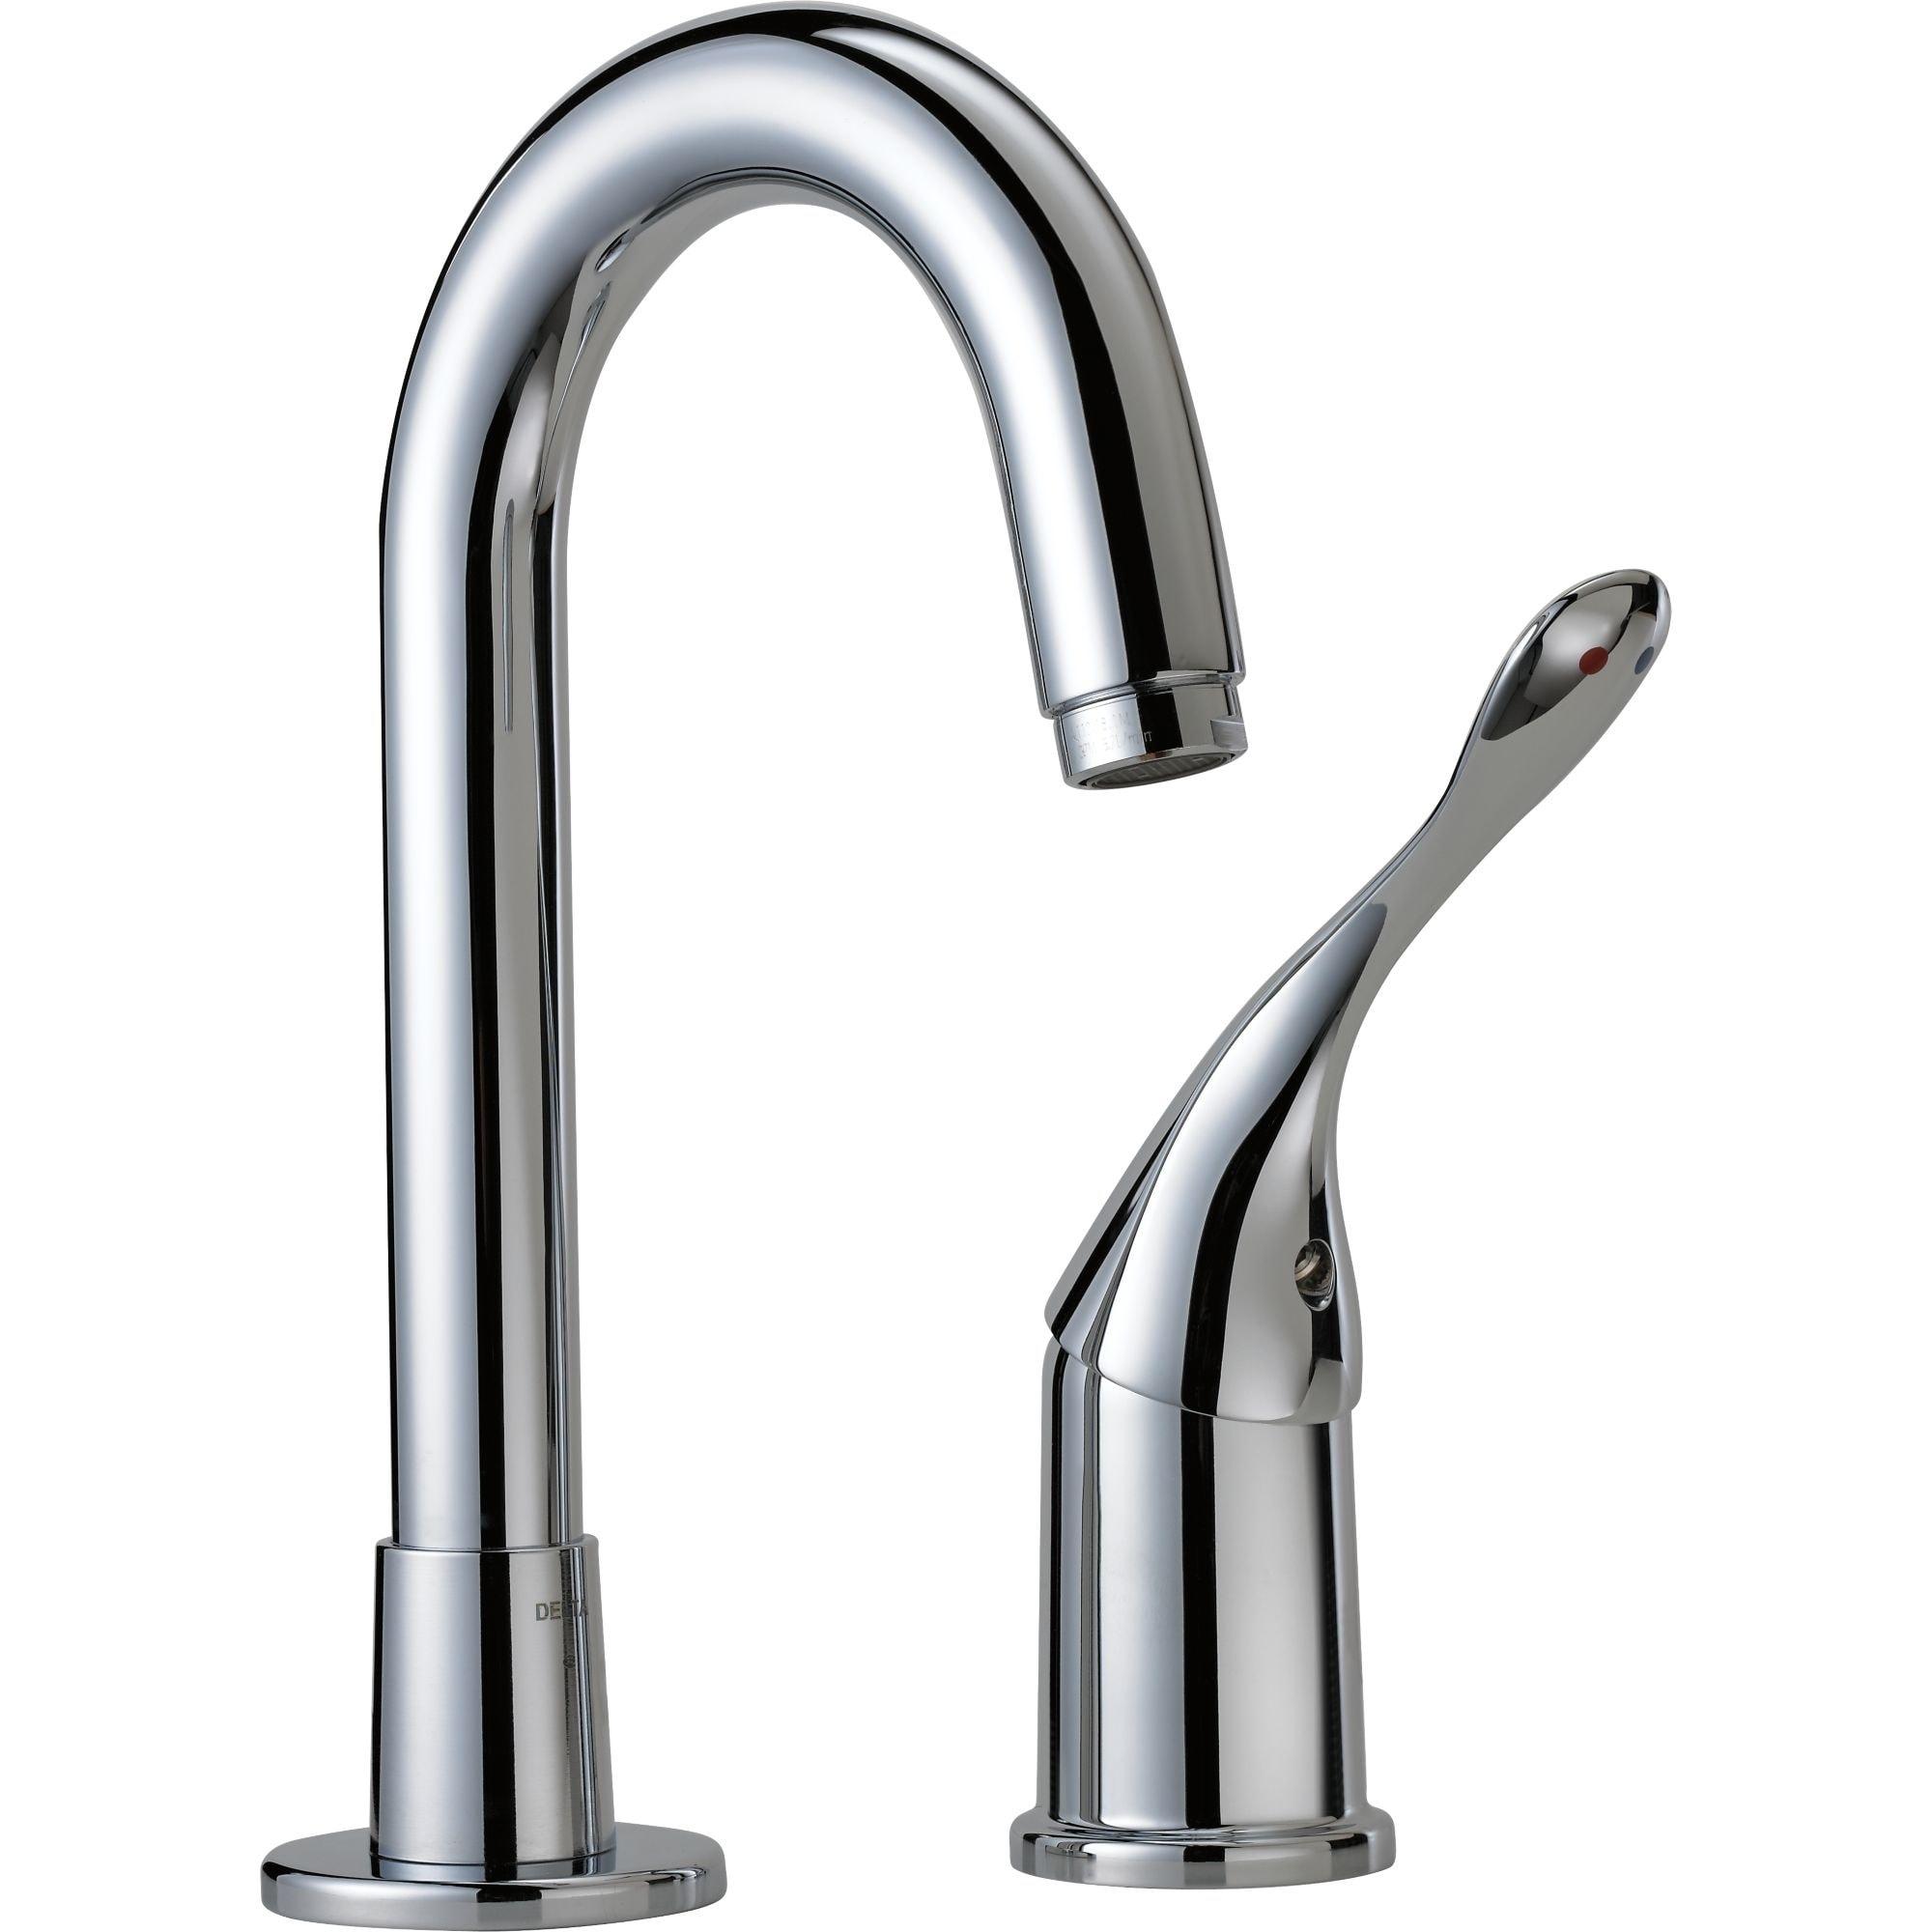 Moen 5923bl Align Spring One Handle High Arc Pulldown Matte Black Kitchen Faucet Overstock 27701519